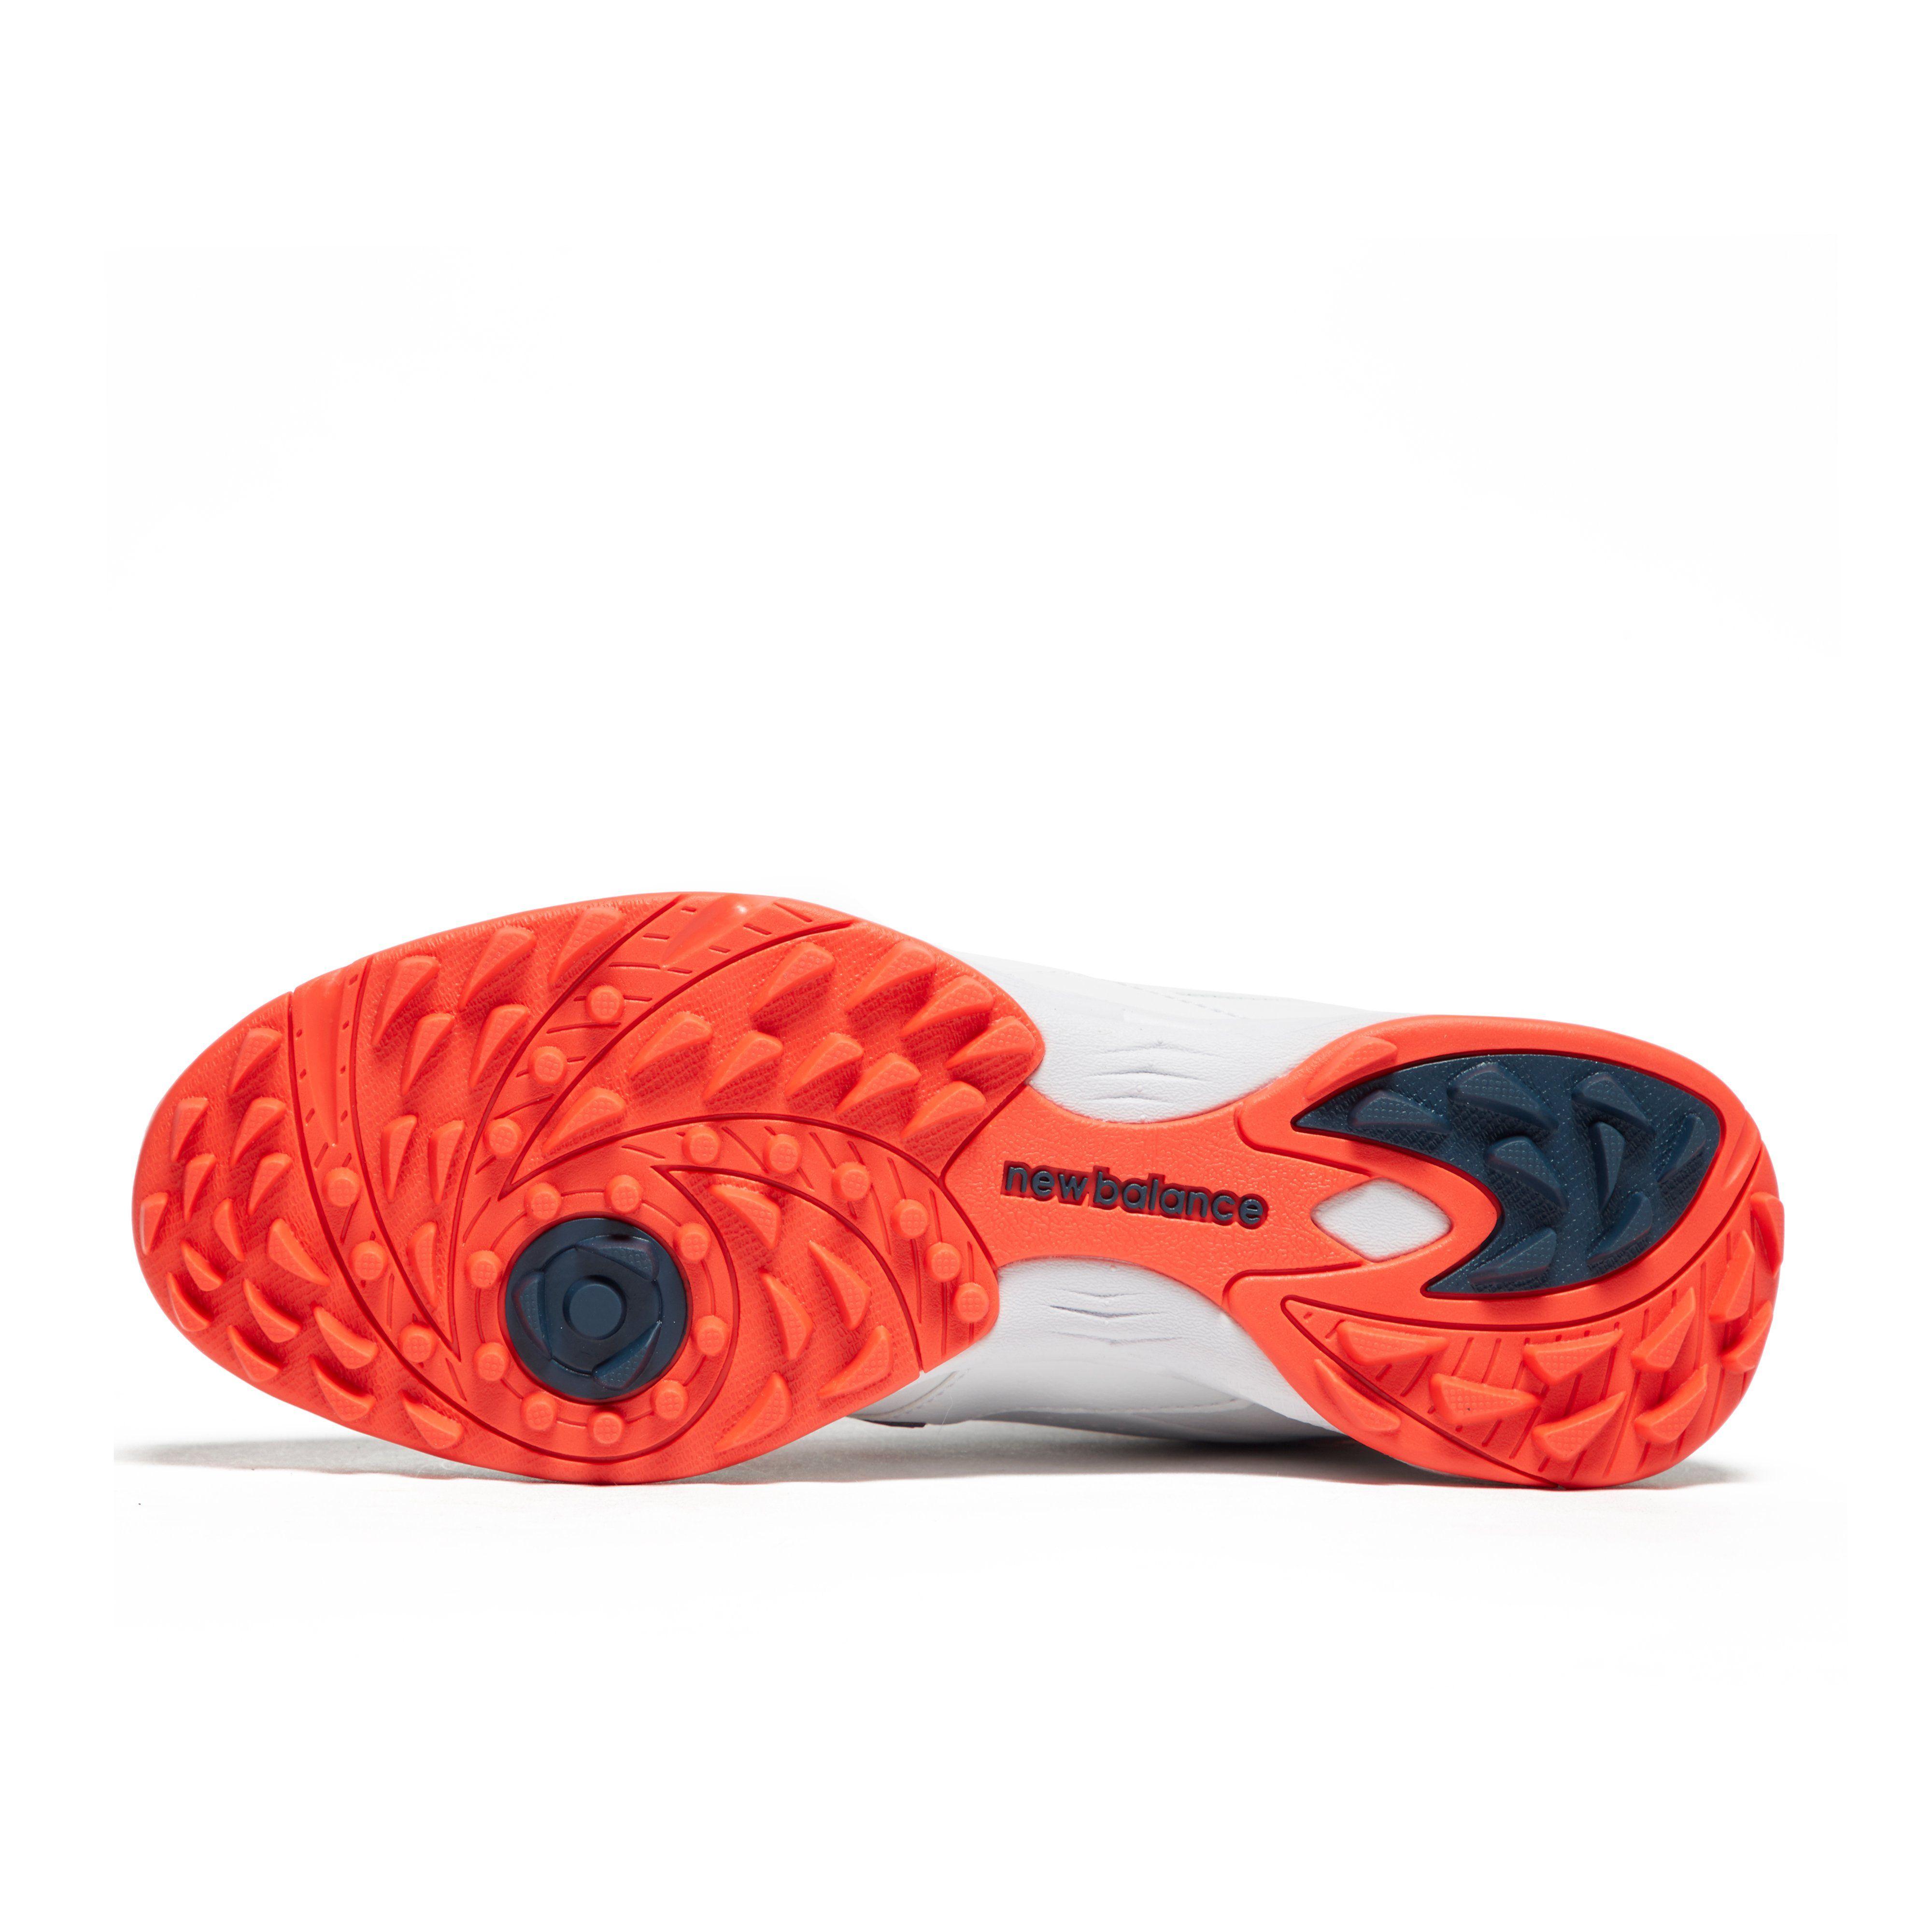 New Balance 4020 Men's Cricket Shoes